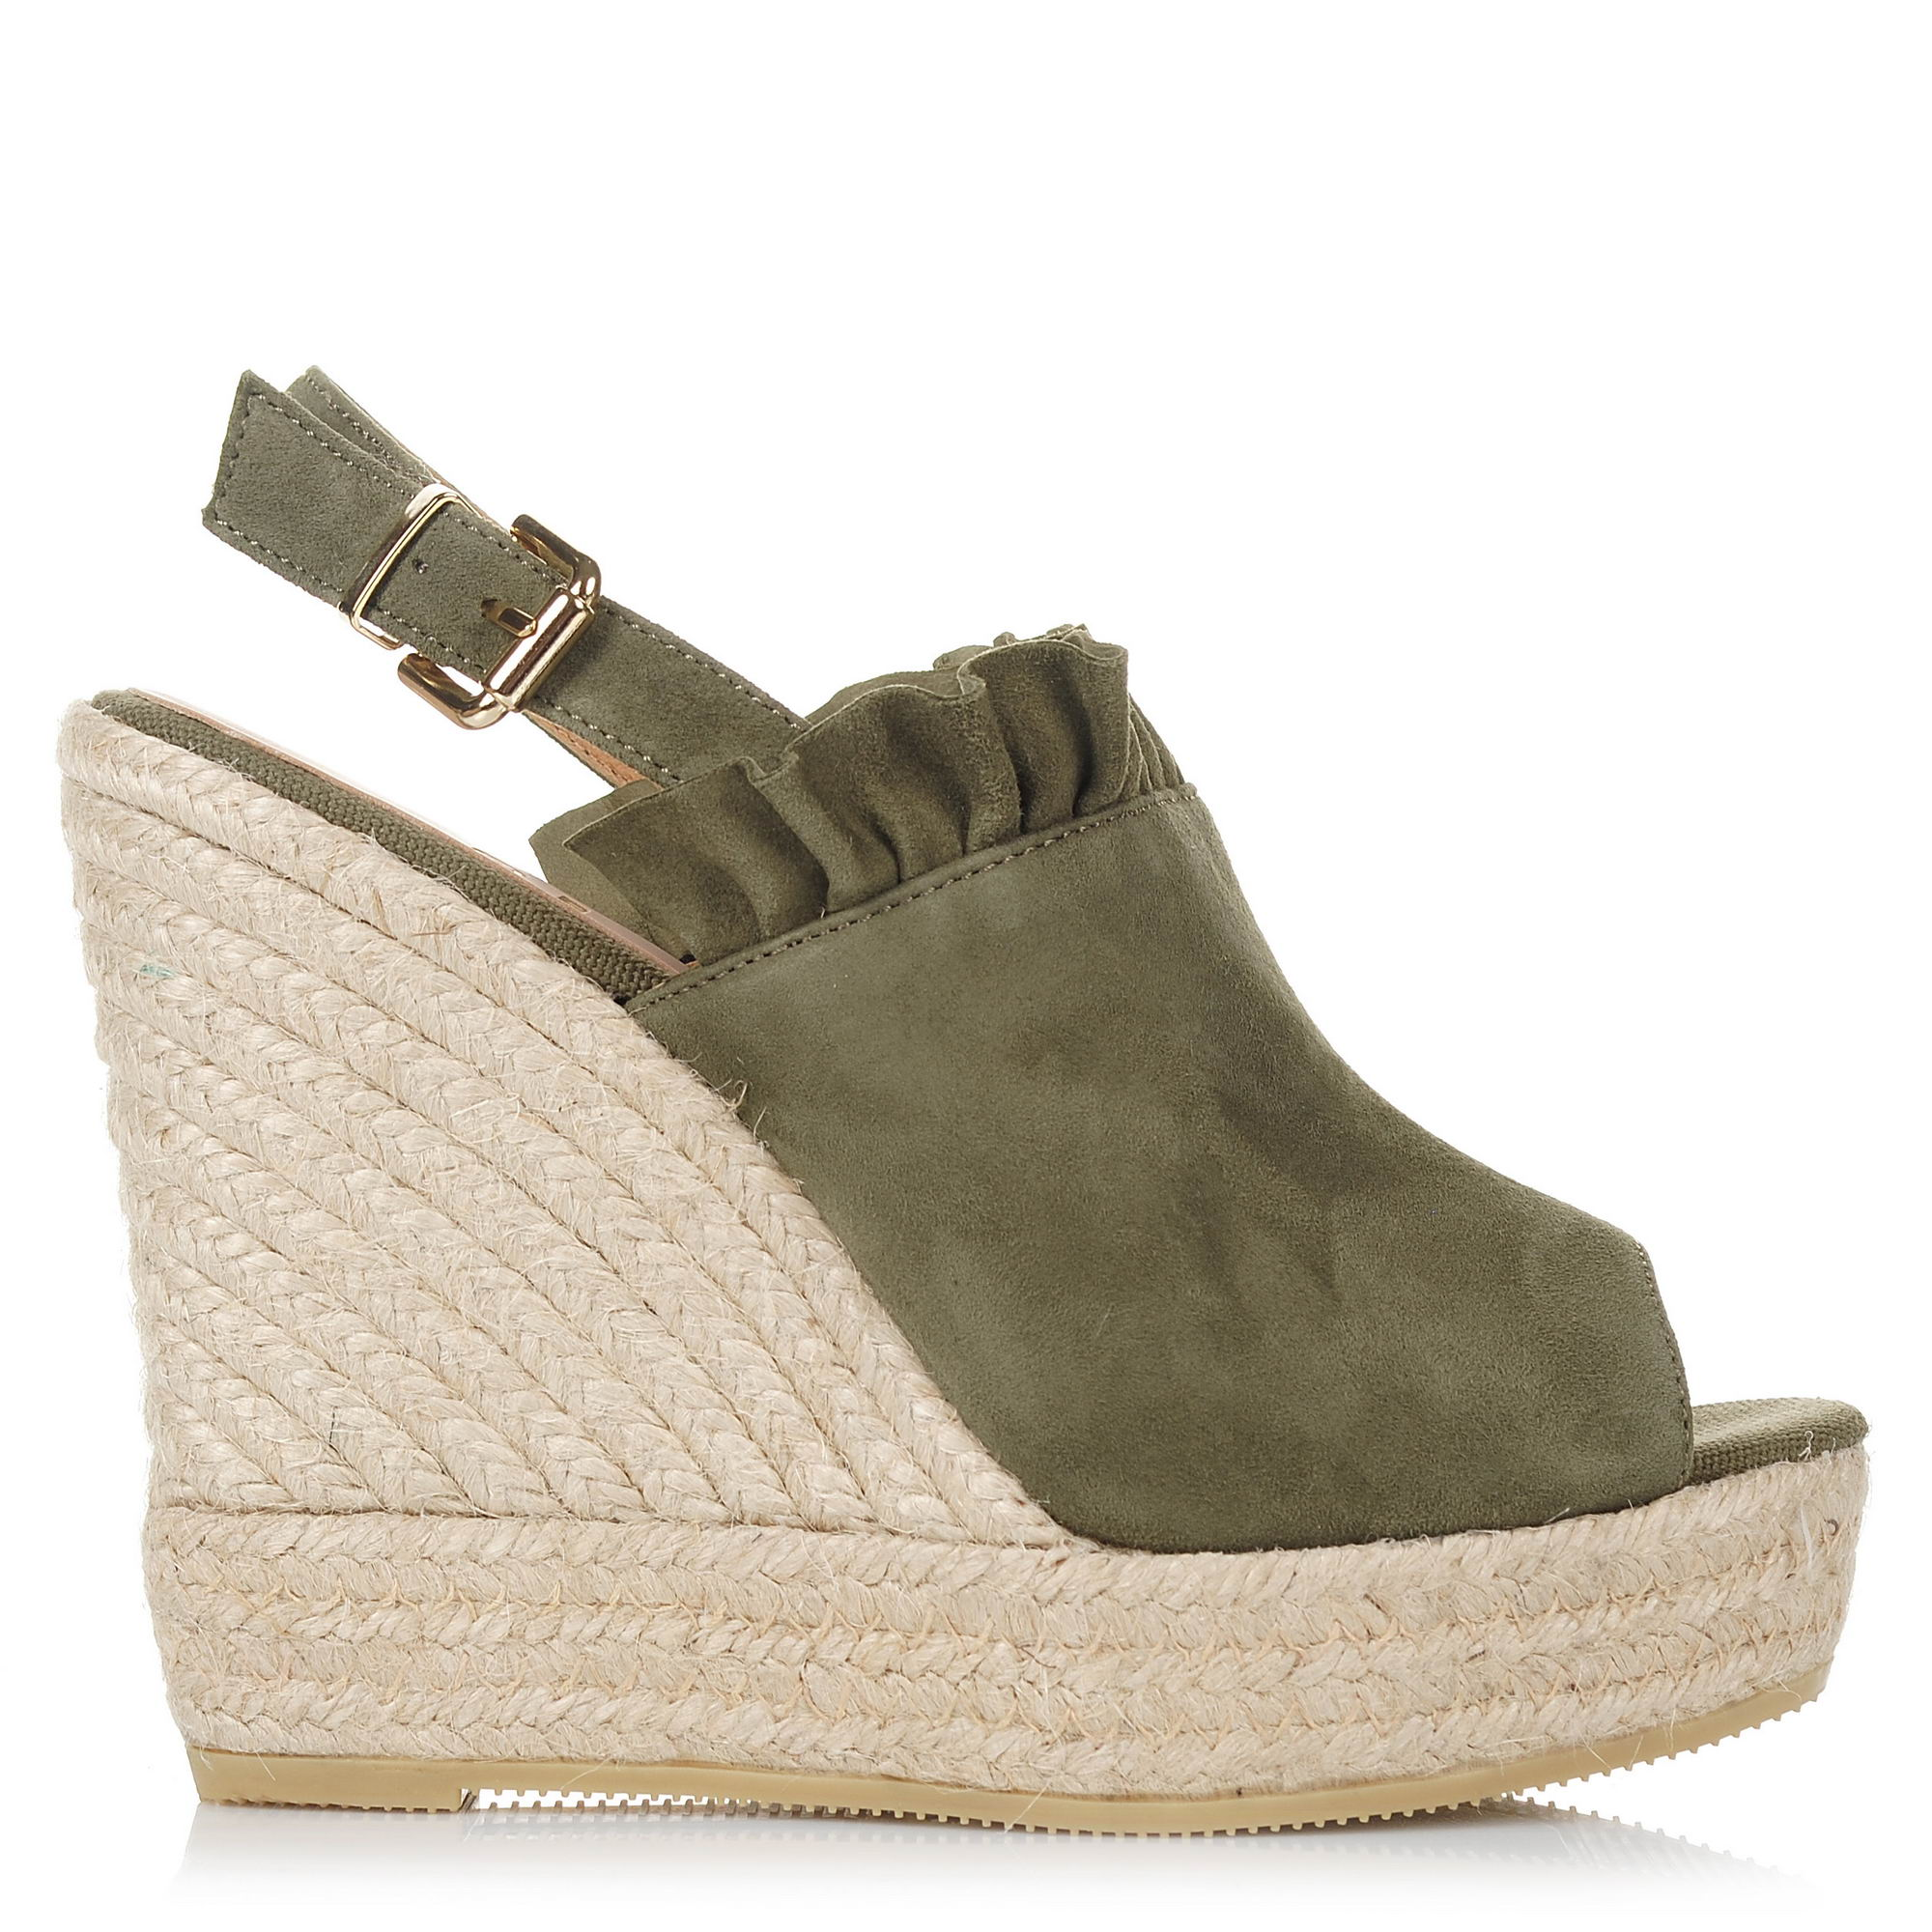 Suede Δερμάτινες Πλατφόρμες Kanna KV8142 γυναικα   γυναικείο παπούτσι